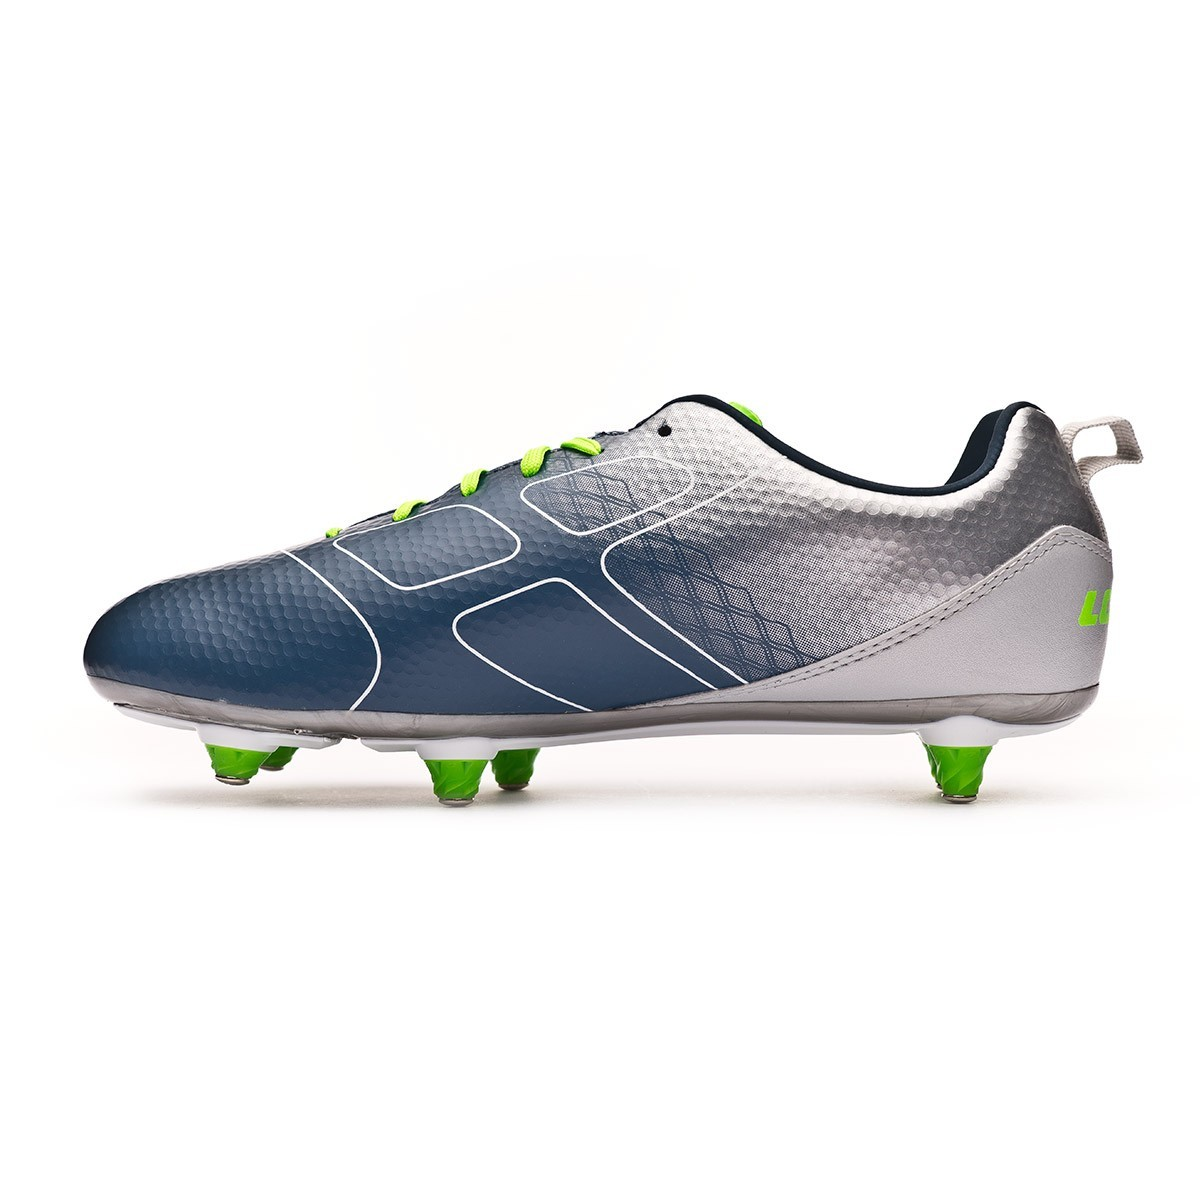 bed248ef5ecb Football Boots Lotto Maestro 700 SG Blue city-Mint - Tienda de fútbol  Fútbol Emotion